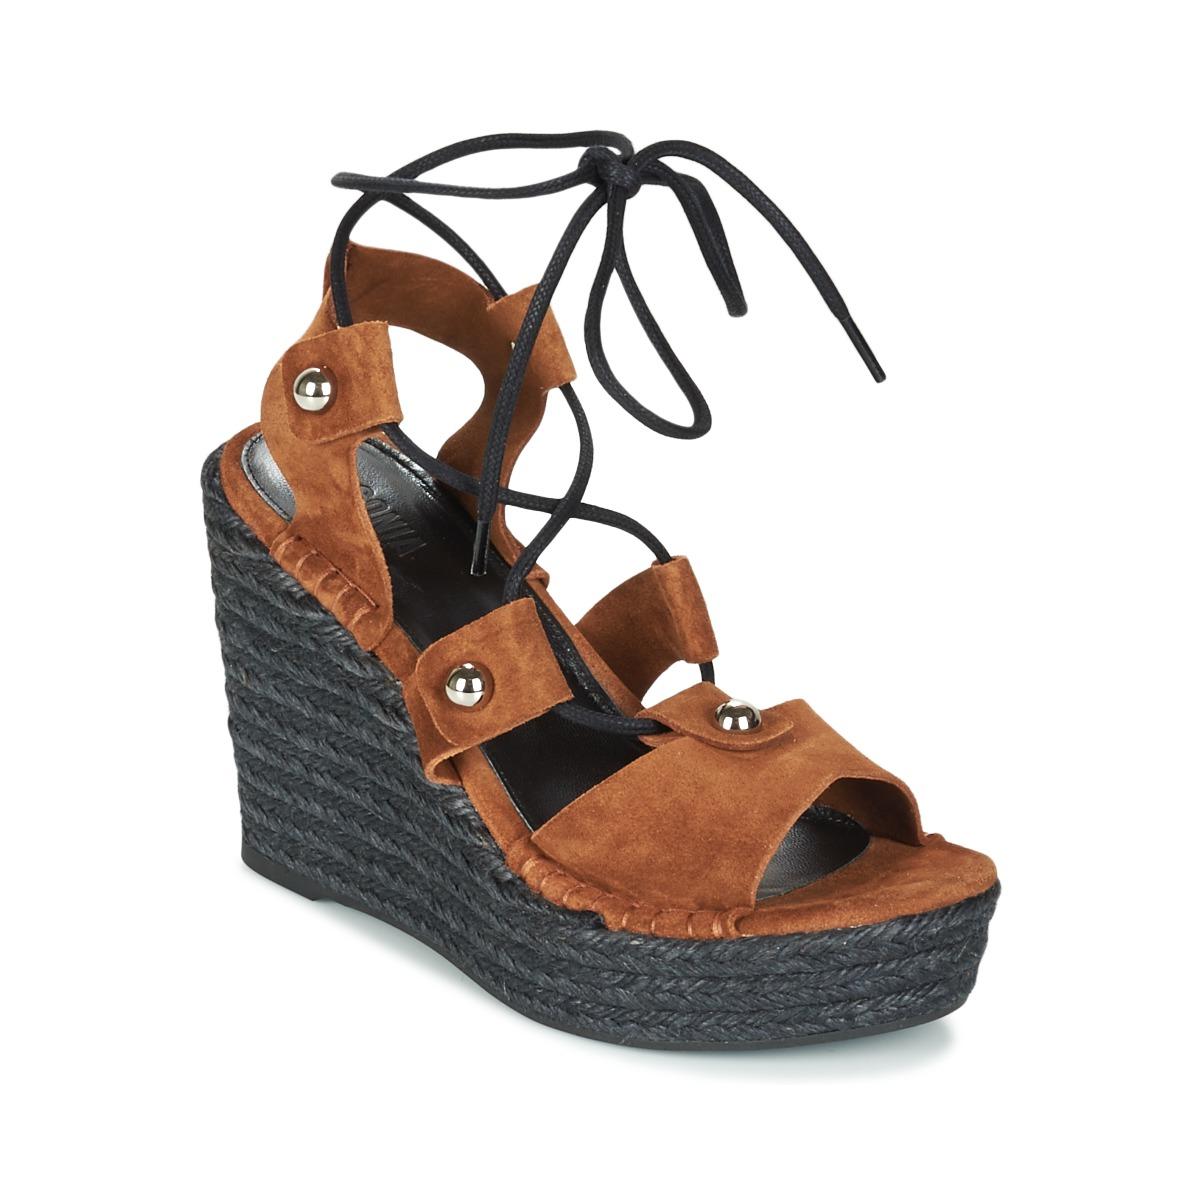 Sonia Rykiel 622908 Tabac - Kostenloser Versand bei Spartoode ! - Schuhe Sandalen / Sandaletten Damen 161,40 €